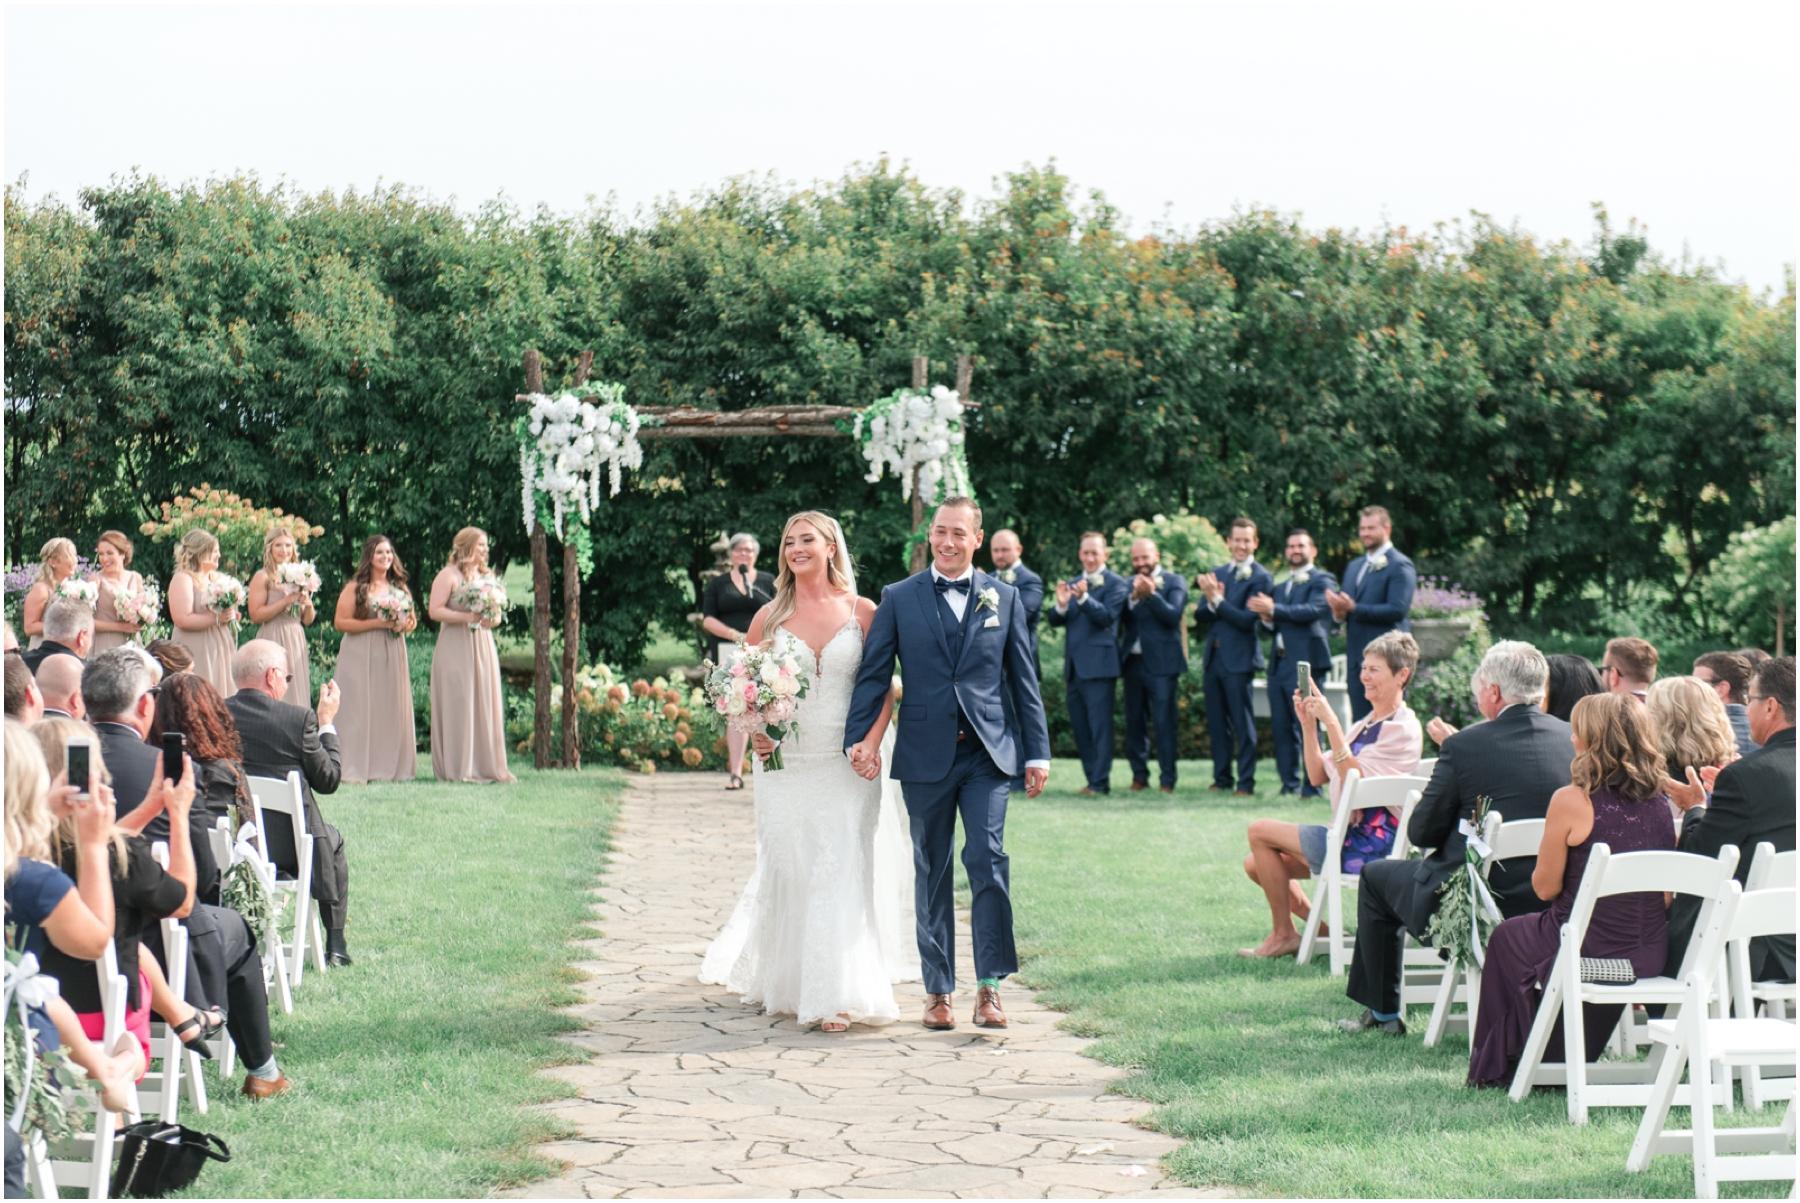 Bloom Field Gardens Wedding Precious Photography Katherine & Chris_050